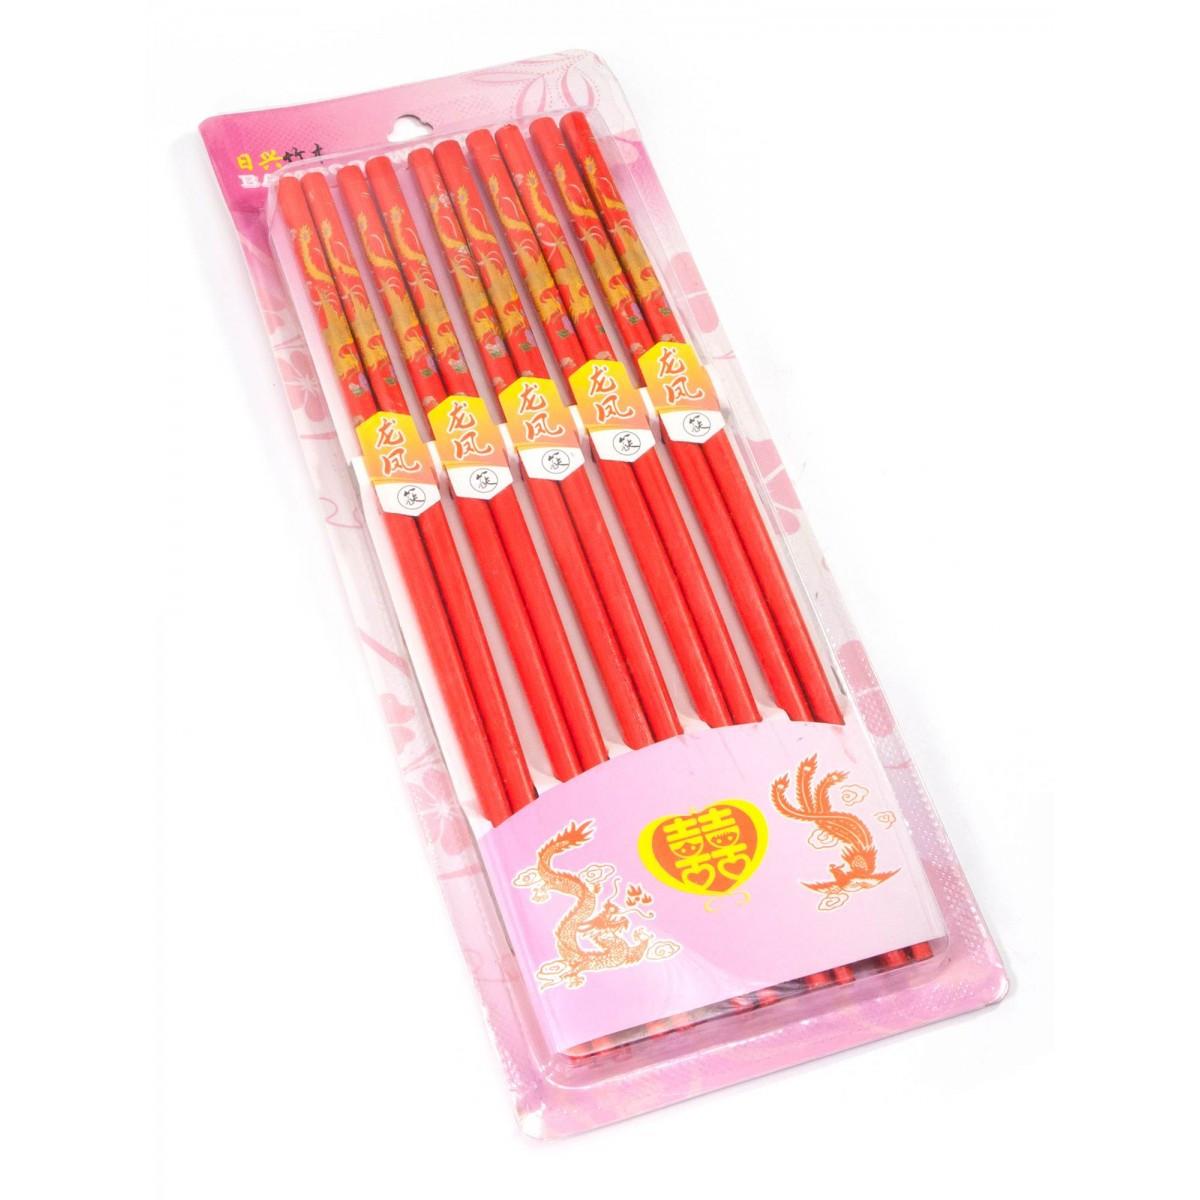 Палички для їжі бамбук (10 пар) (29х11х1,5 см)